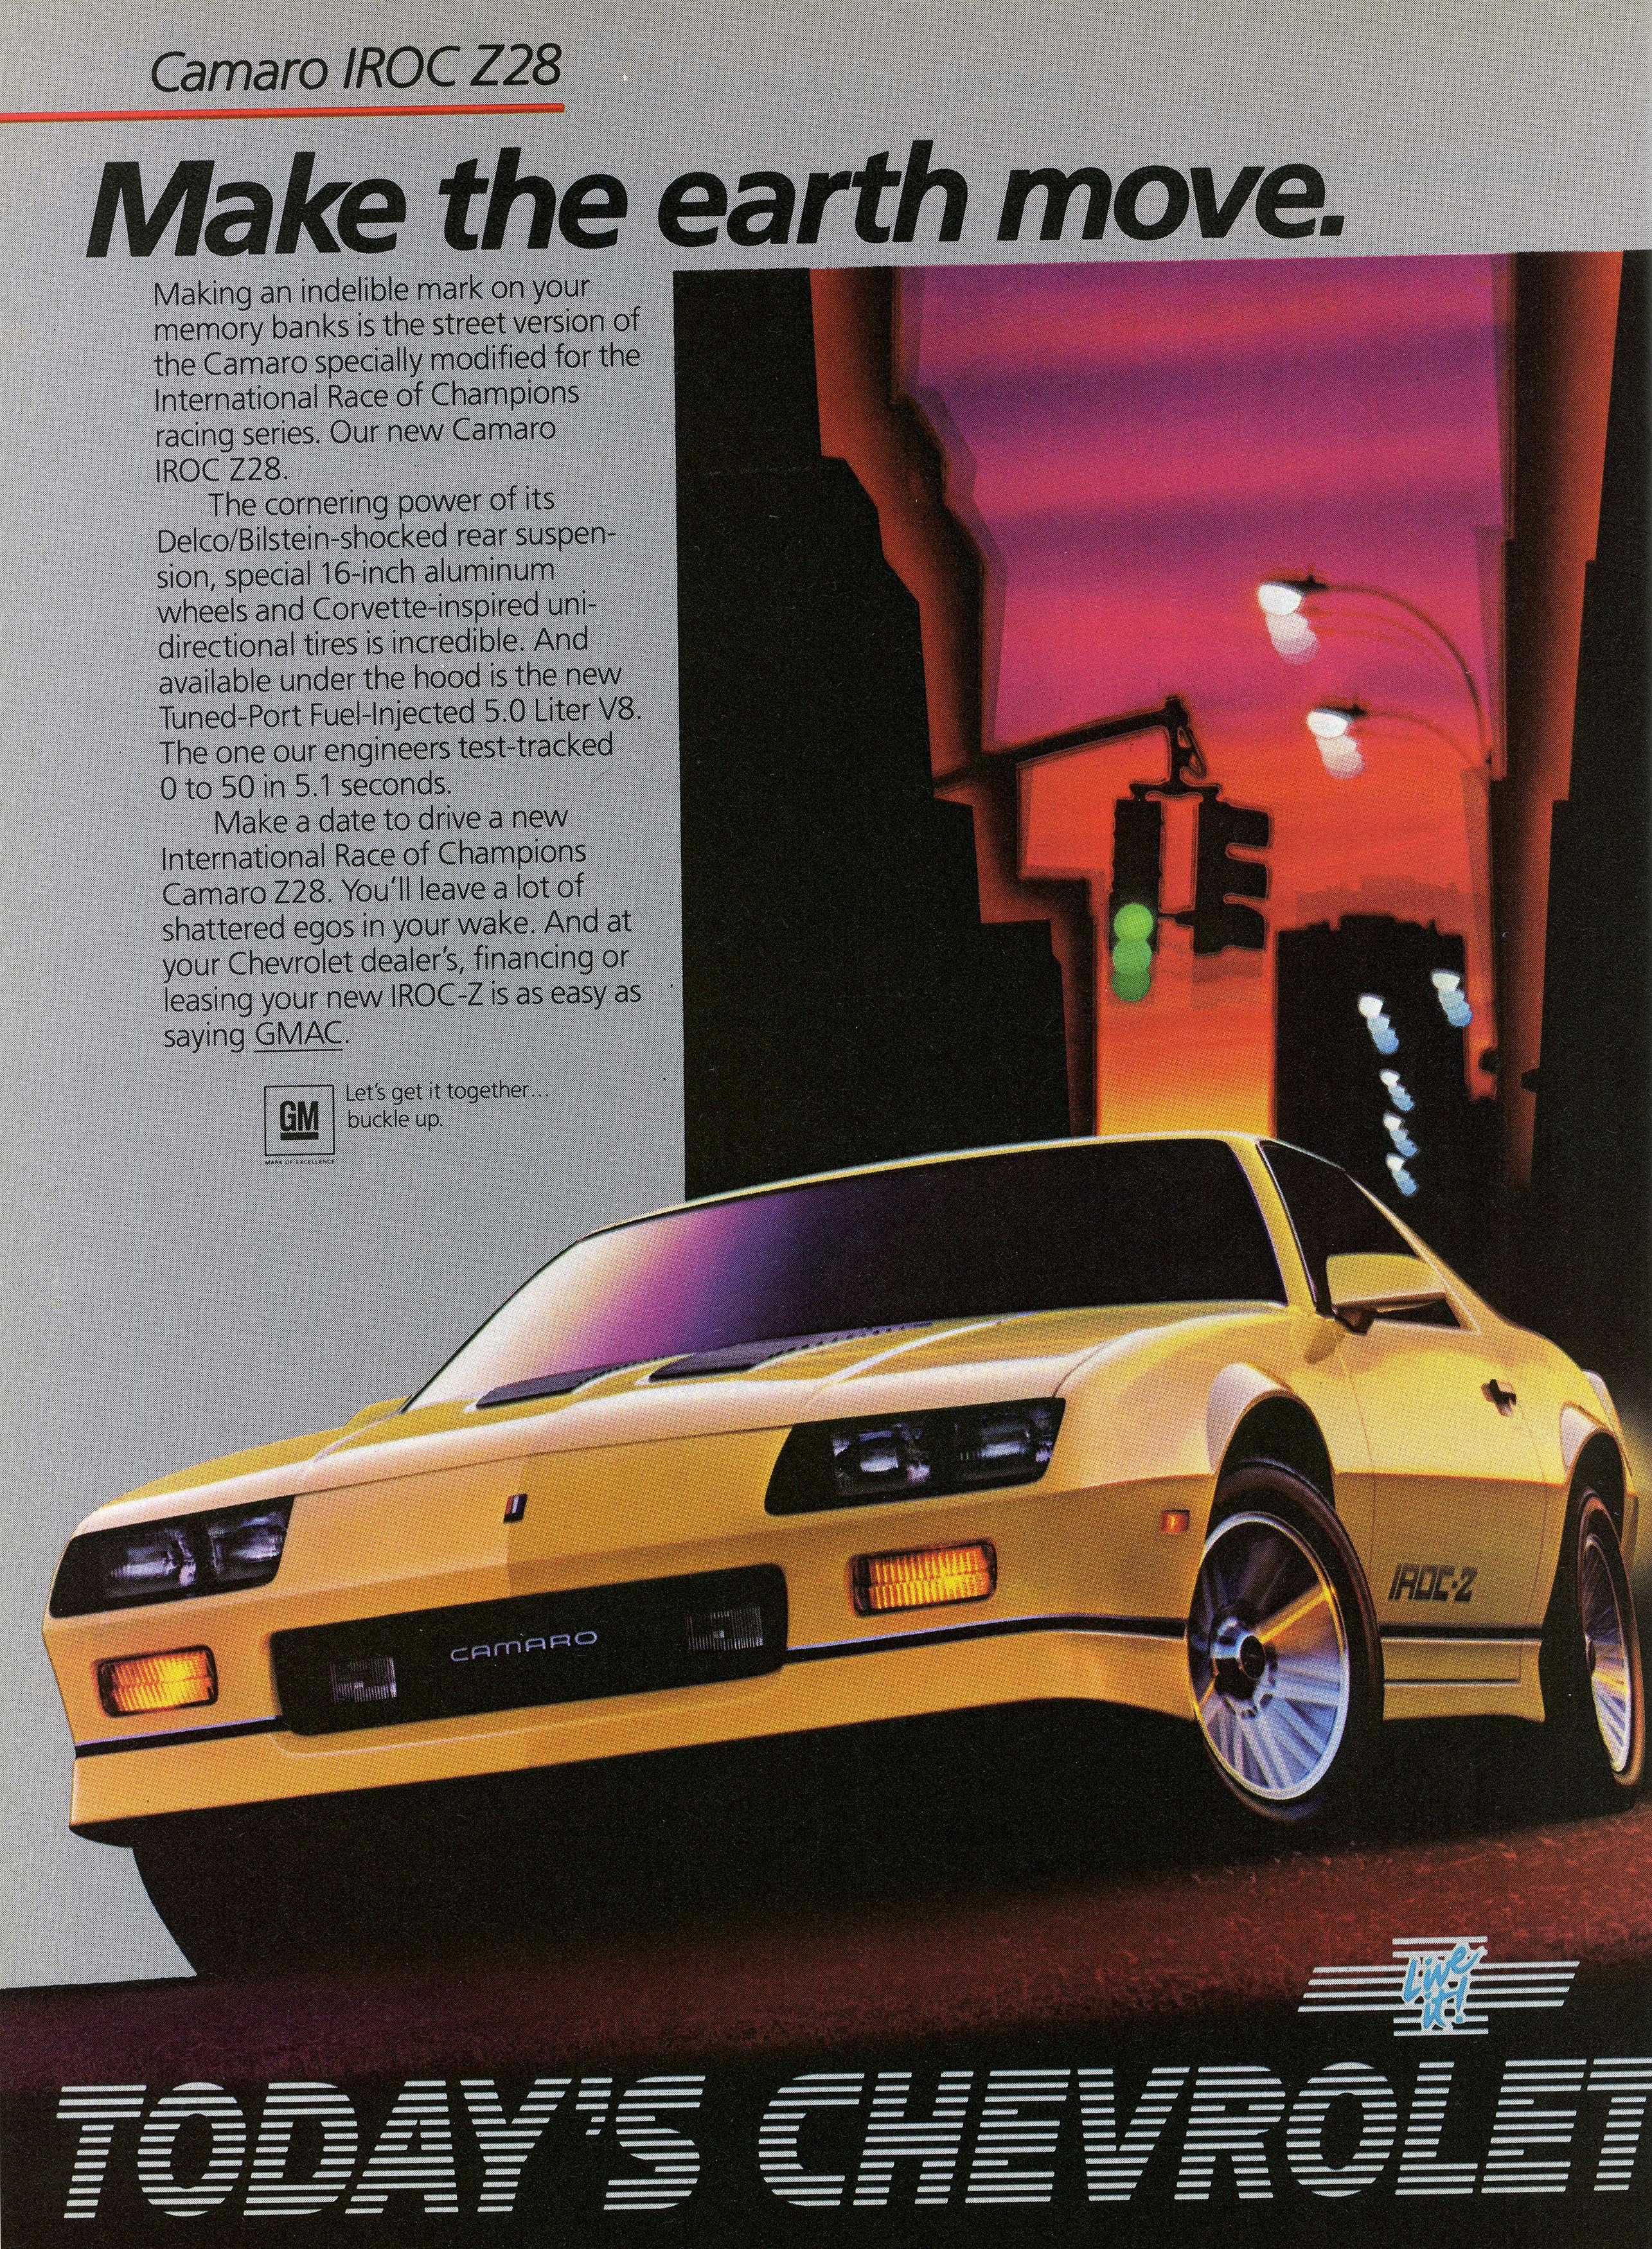 Heartbeat of America: The Chevy Camaro IROC-Z, 1985 – 1990